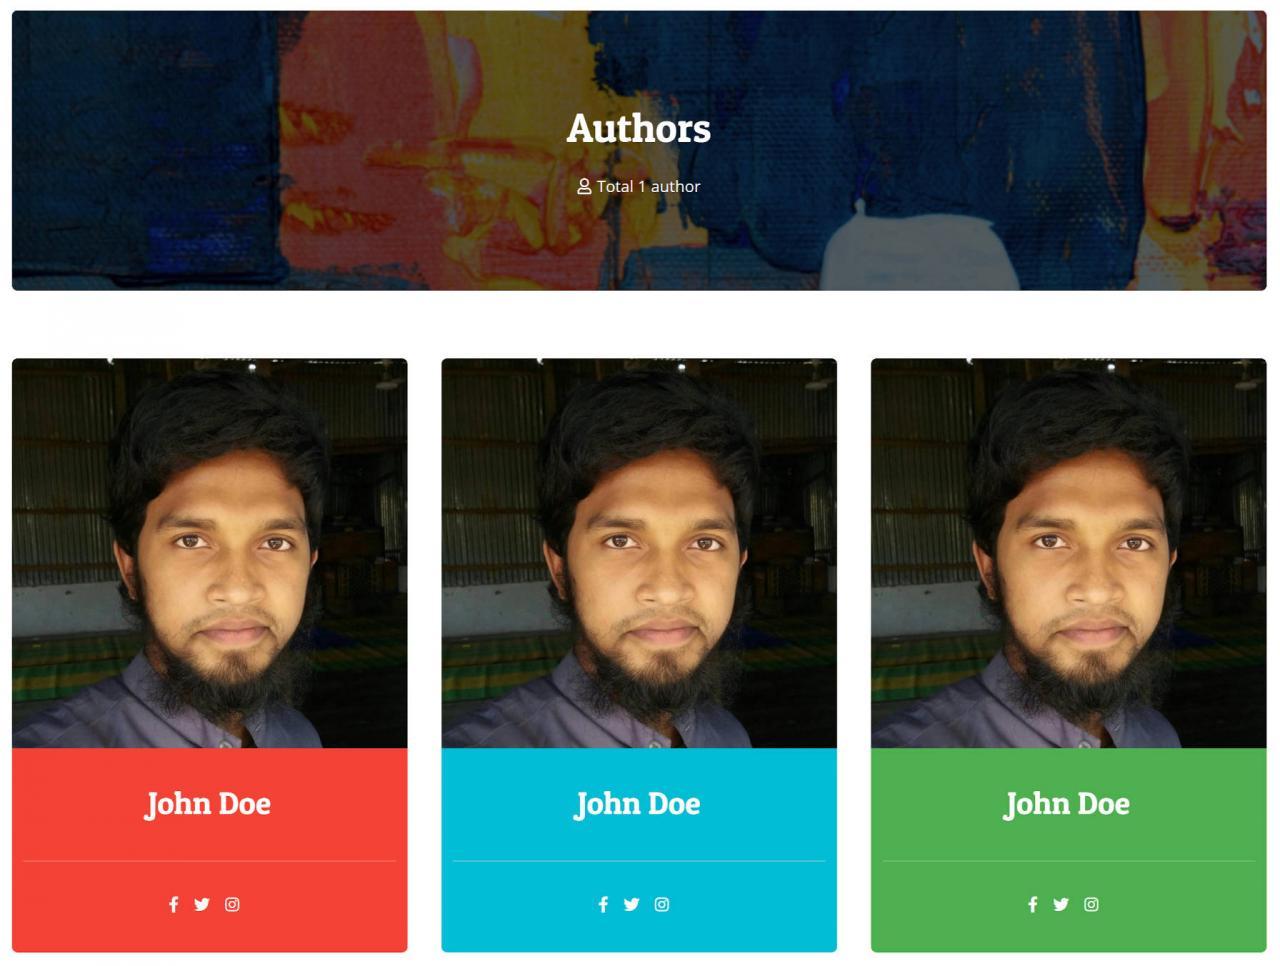 churel是一个多彩且极简主义的块就绪WordPress主题6 churel是一个丰富多彩且极简的块就绪WordPress主题